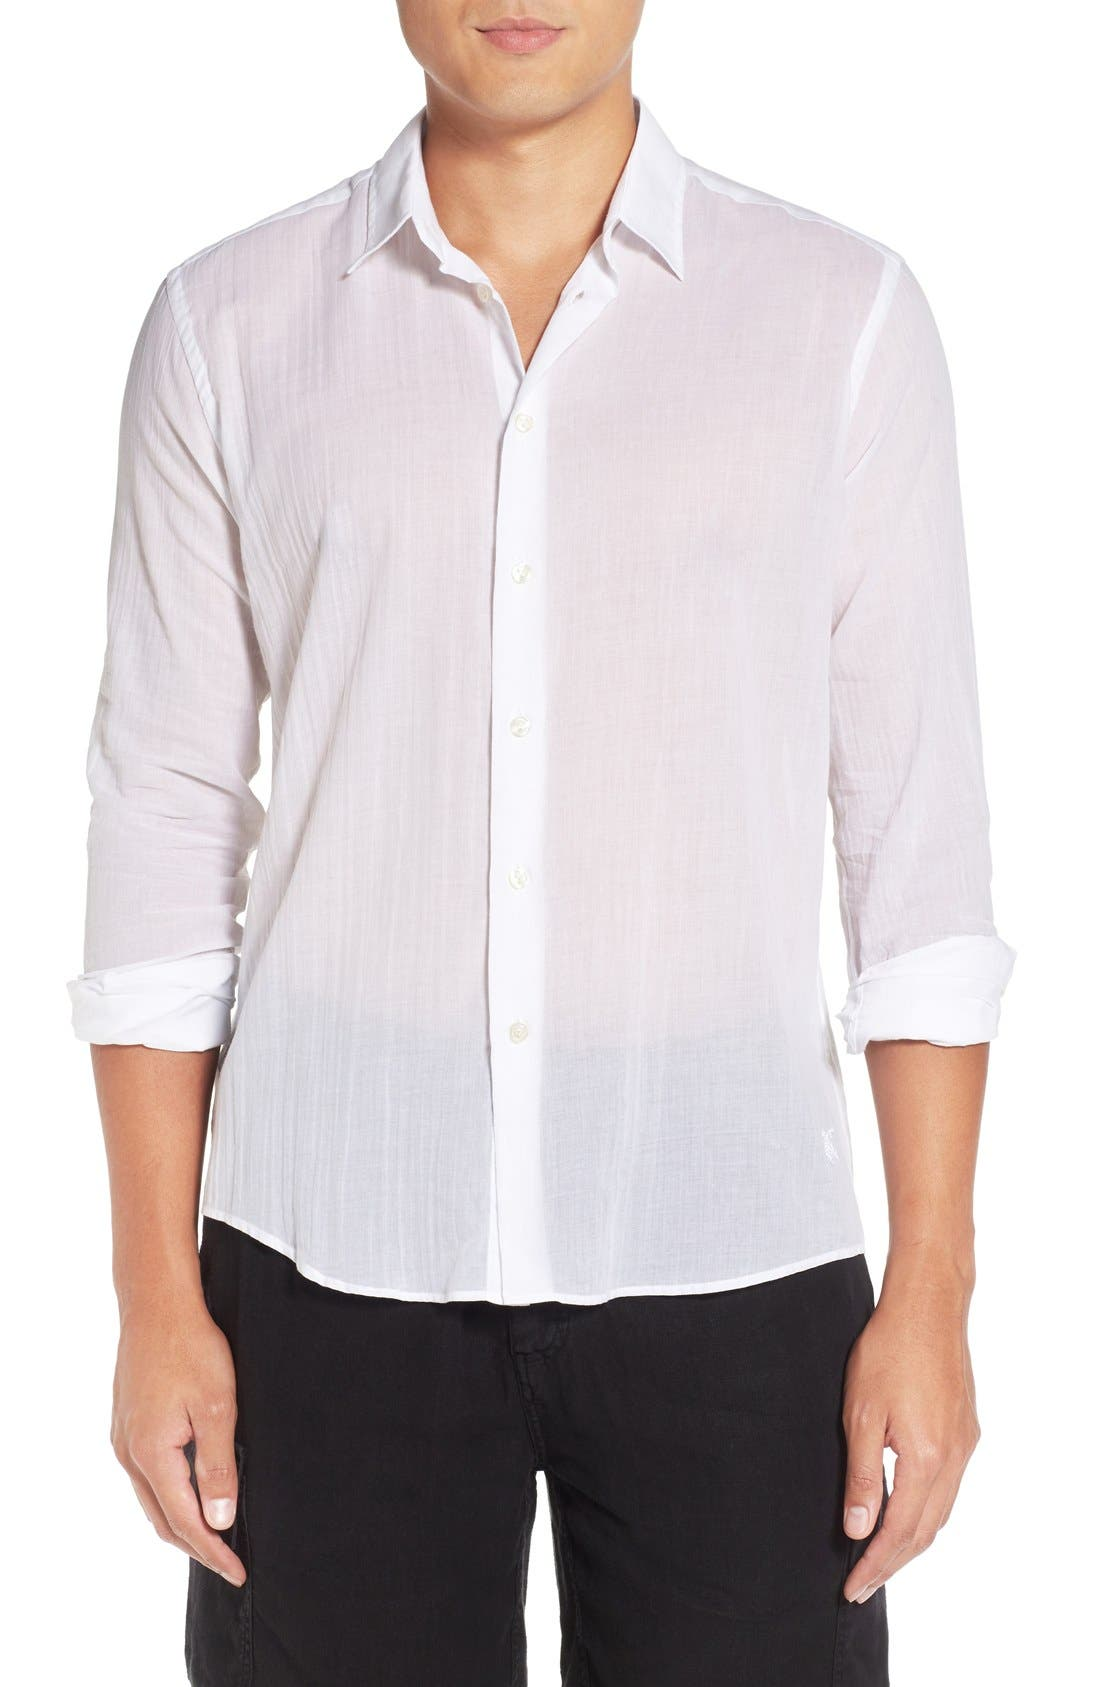 Main Image - Vilebrequin Cotton Voile Sport Shirt